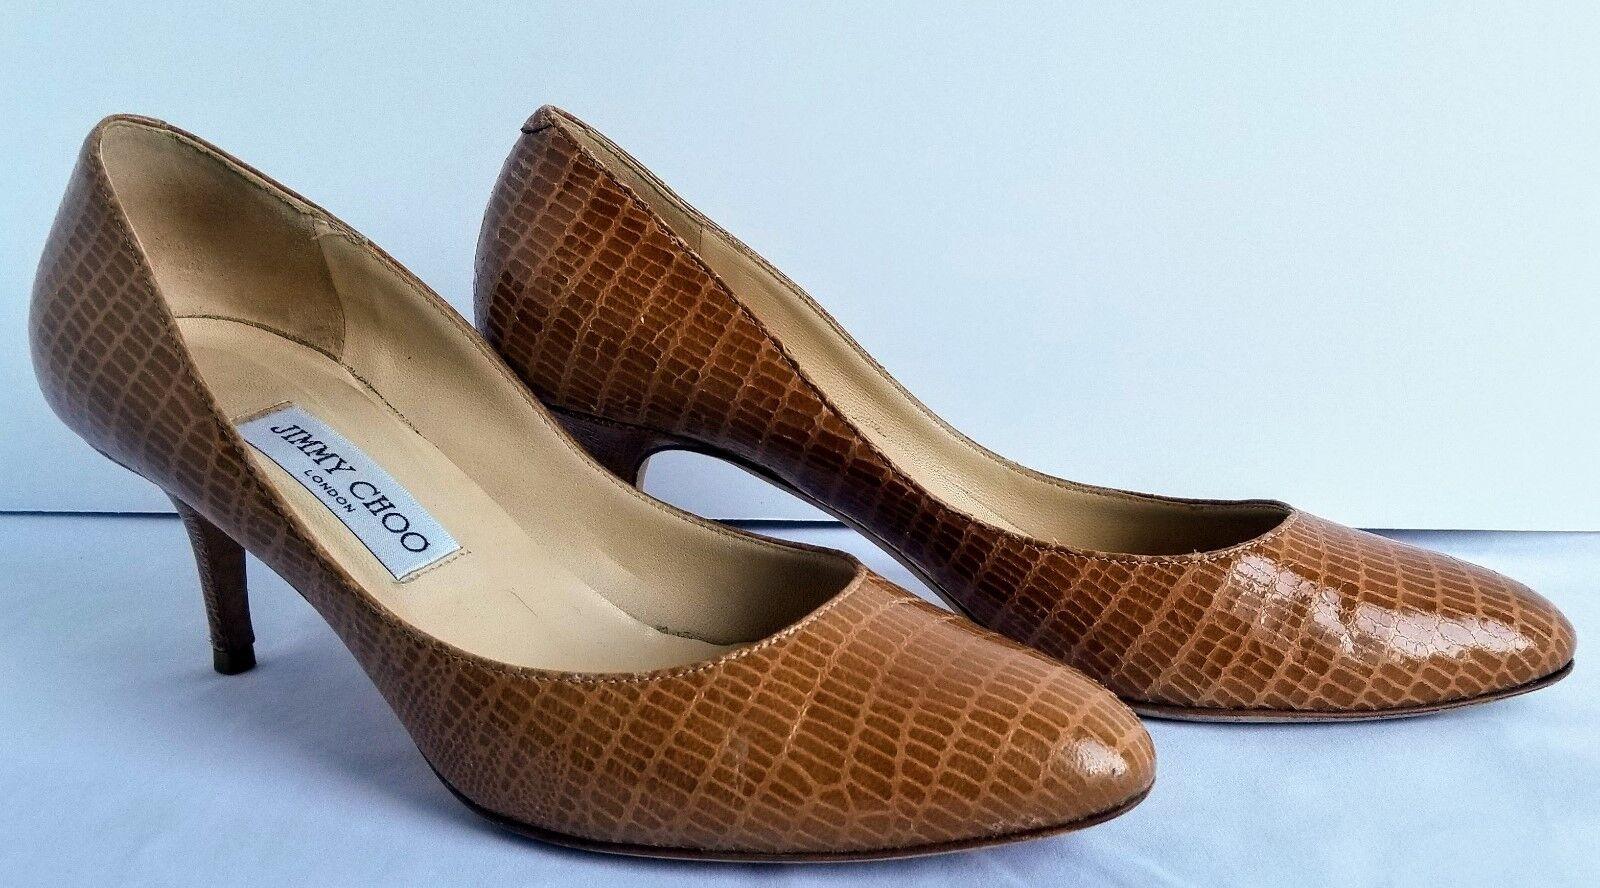 JIMMY CHOO Irena Lizard Embossed Leather Round Toe Pumps Heels 38½ US 7½ Sand